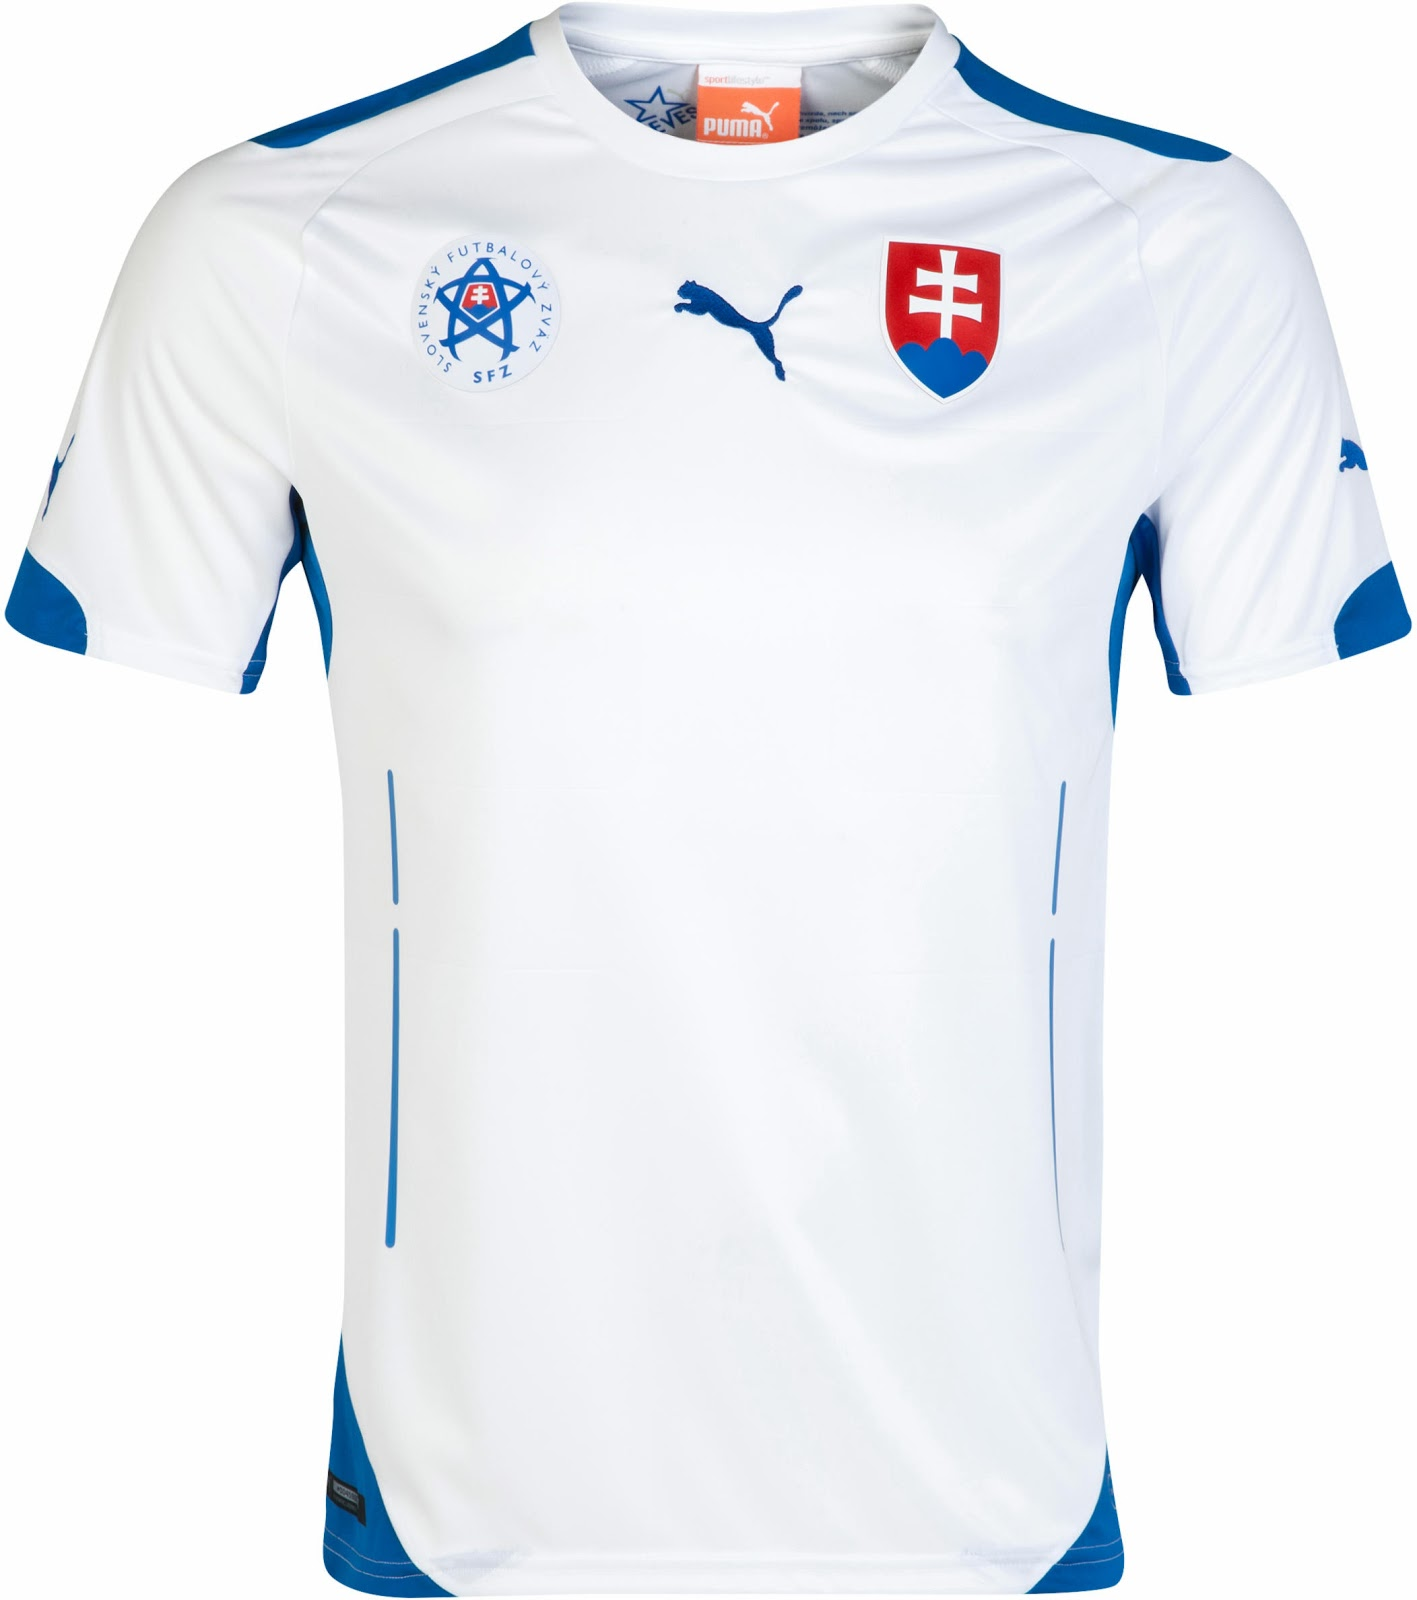 http://2.bp.blogspot.com/-zLugHNlO4tg/UyChH3M_4vI/AAAAAAAANnc/eKAOu6sGjdU/s1600/Slovakia+2014+Home+Kit.jpg